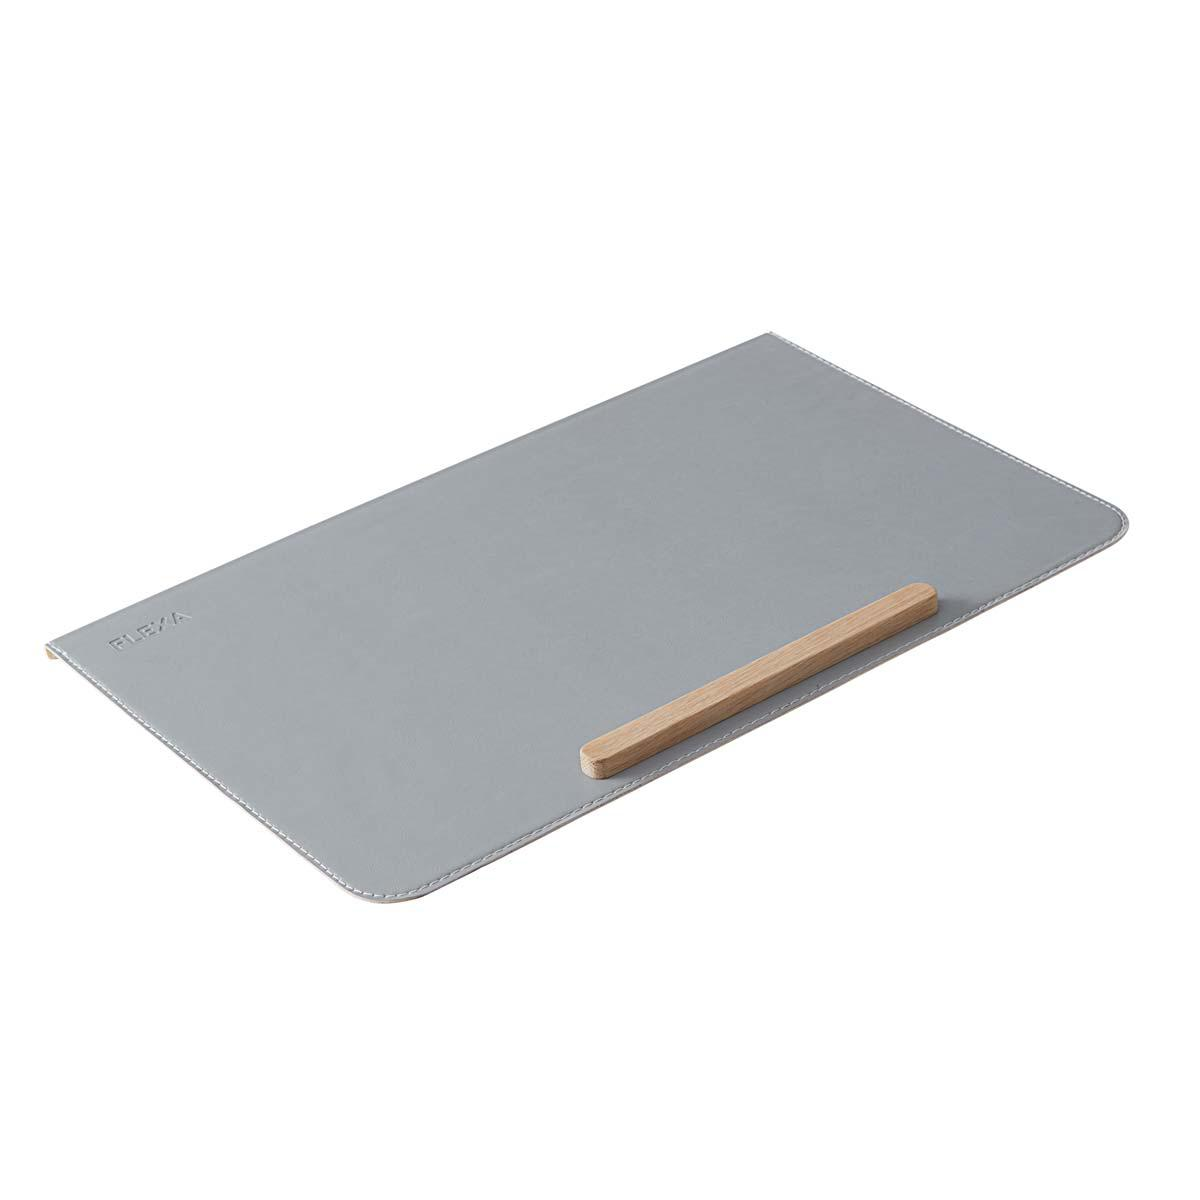 Protector escritorio EVO-MOBY-WOODY Flexa gris